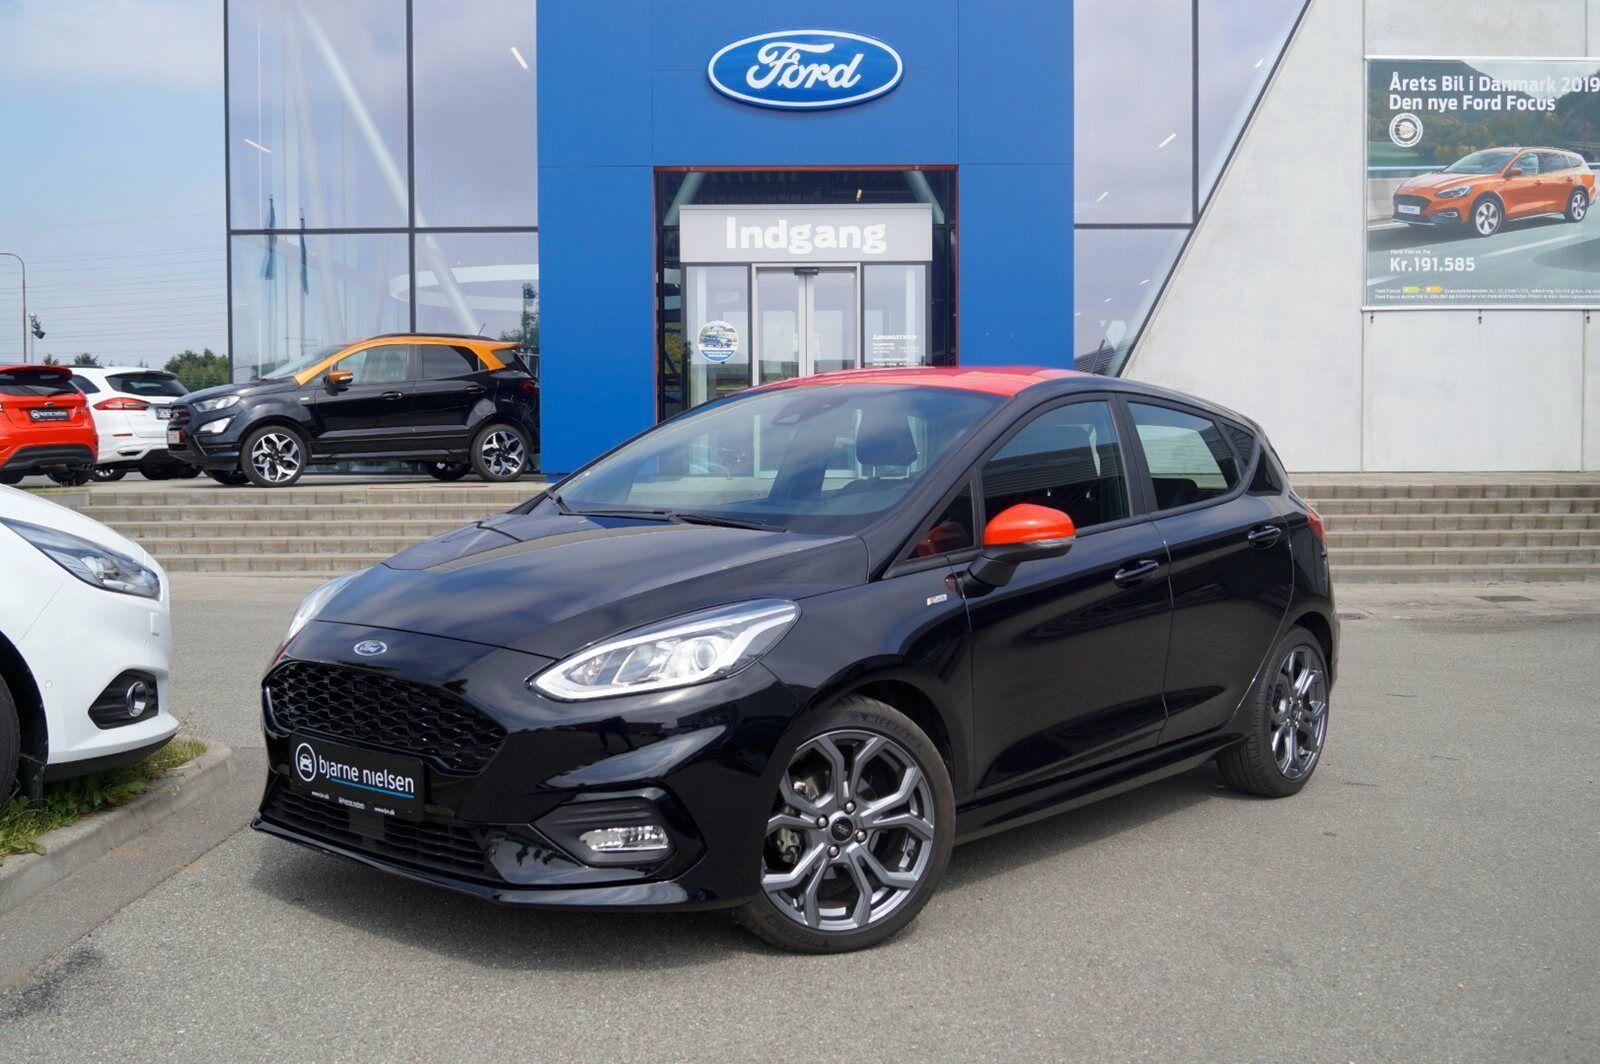 Ford Fiesta 1,0 SCTi 100 ST-Line